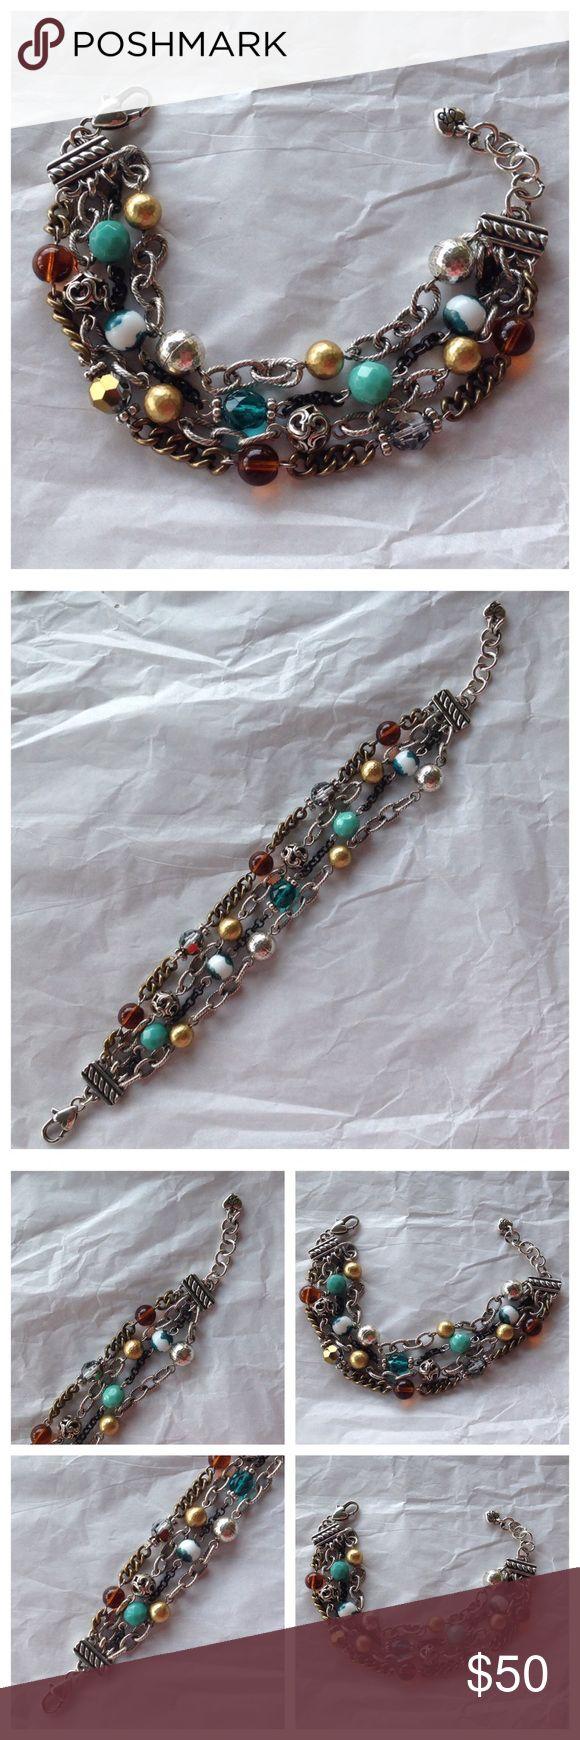 "Gorgeous Brighton 4 Strand Beaded Bracelet Brighton. Beautiful 4 strand Beaded bracelet. 9"" with extension. Absolutely gorgeous bracelet that goes with about anything!! Excellent condition! Brighton Jewelry Bracelets"